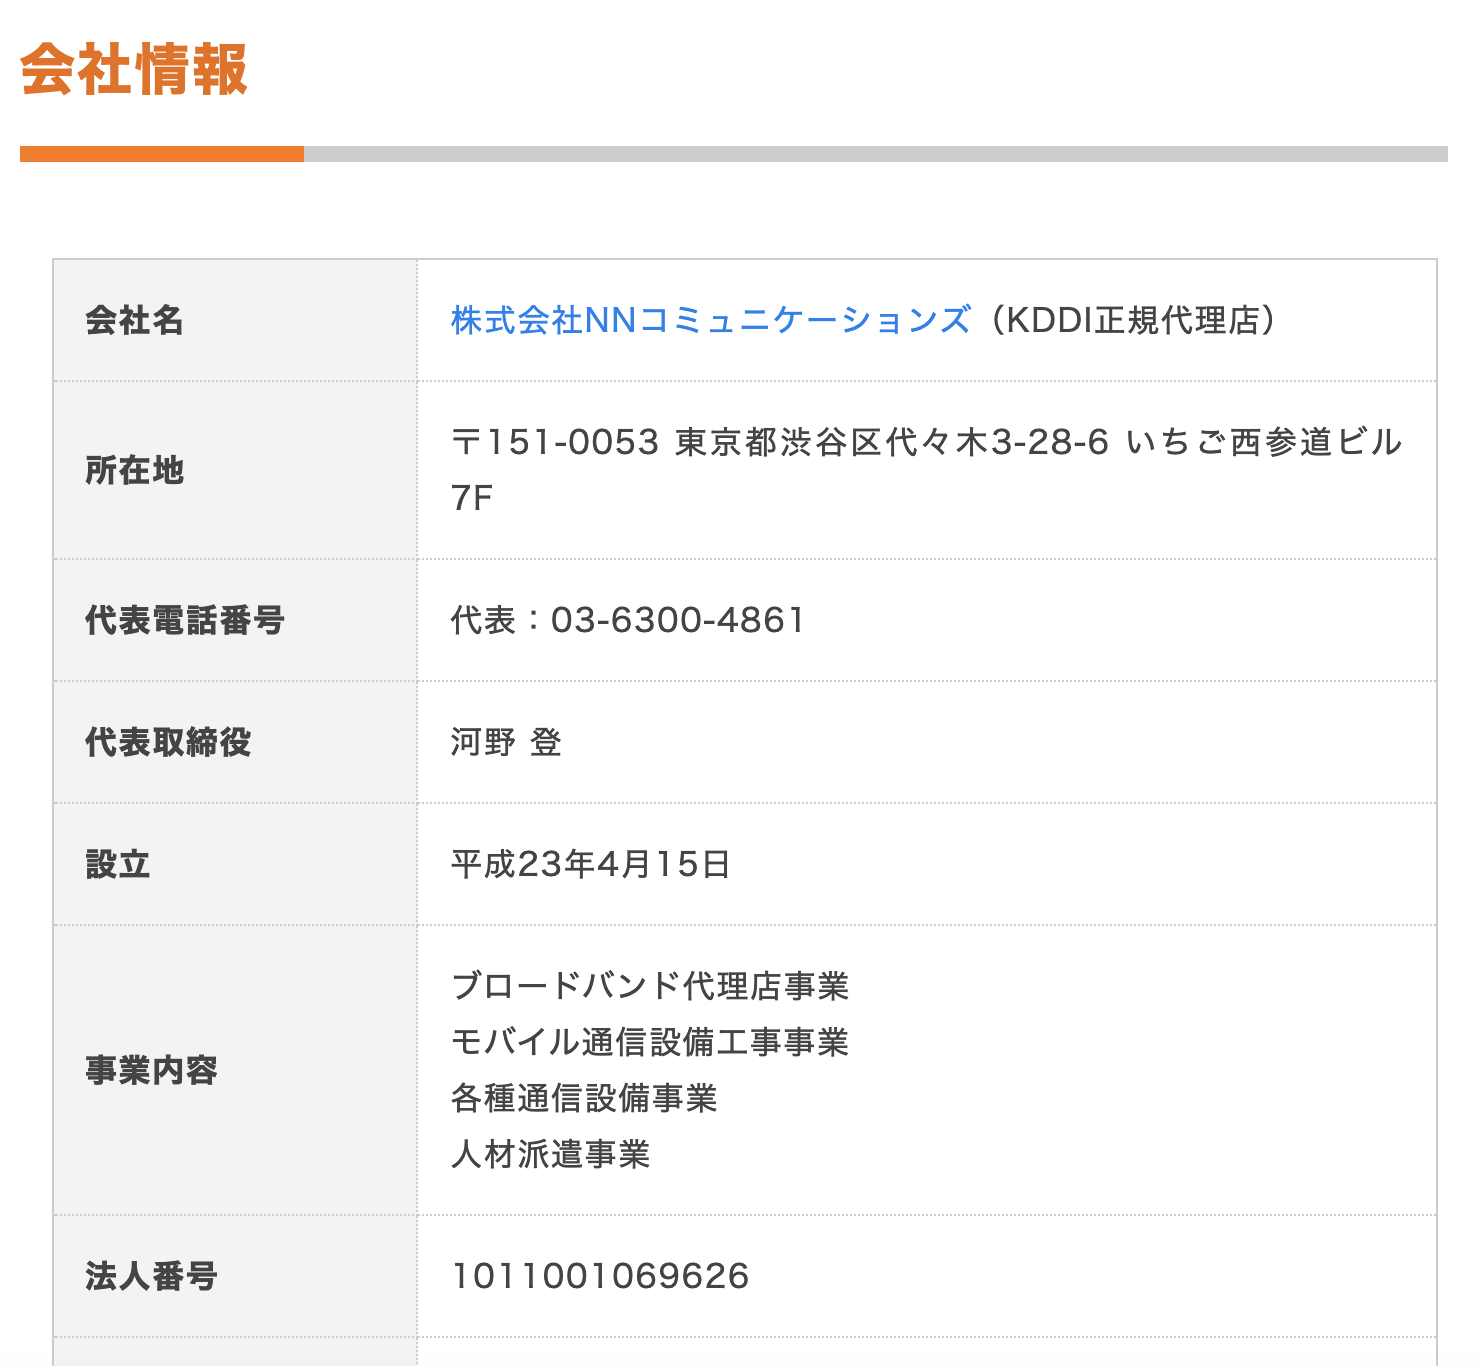 NNコミュニケーションズの会社情報